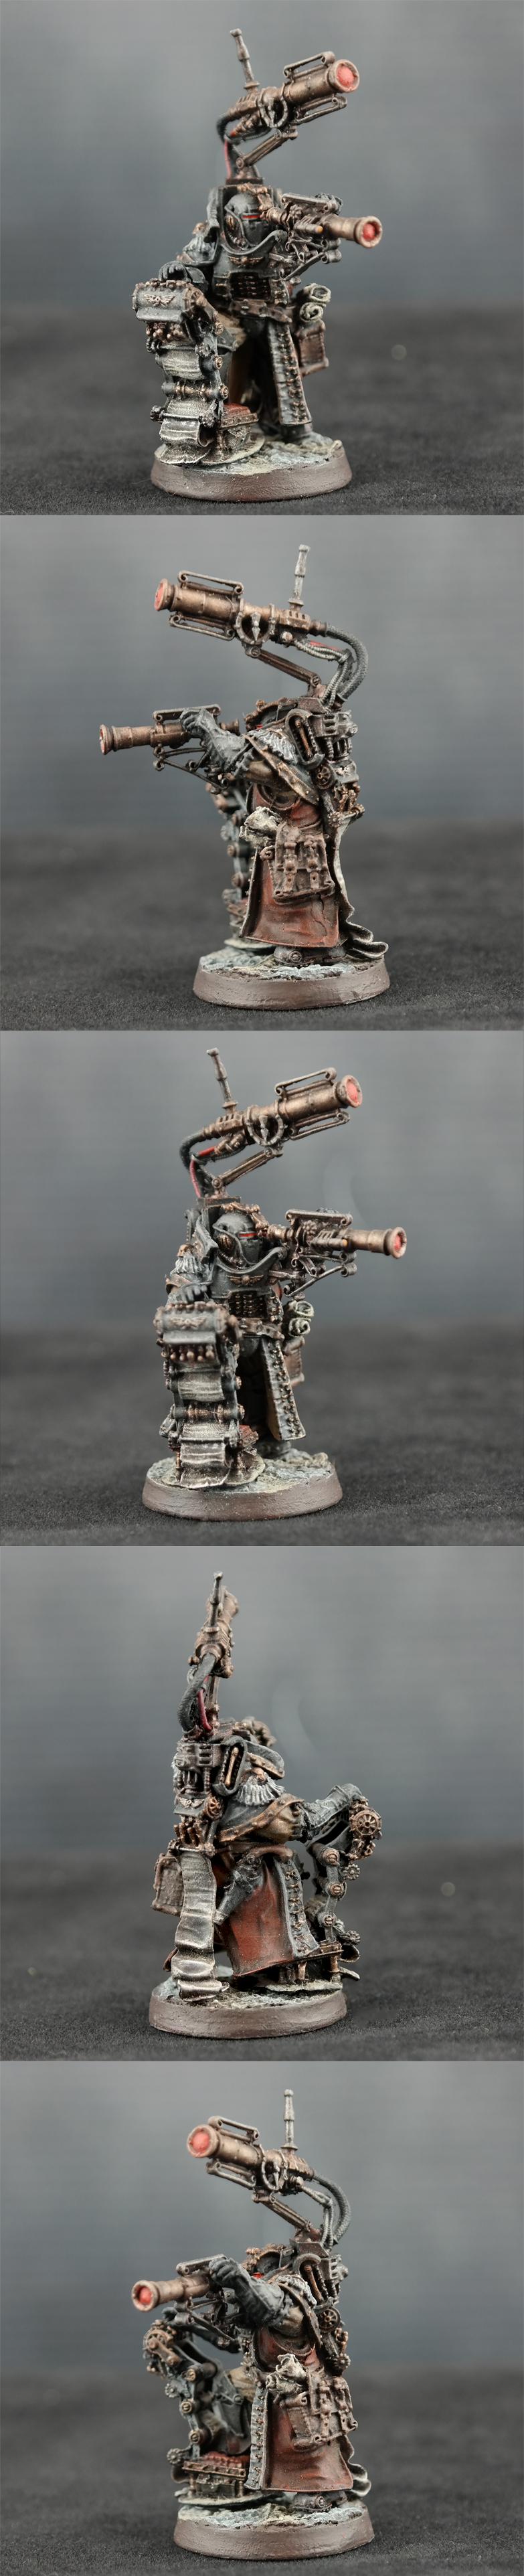 30k, Forge World, Horus Heresy, Rust Scorpions, Solar Auxilia